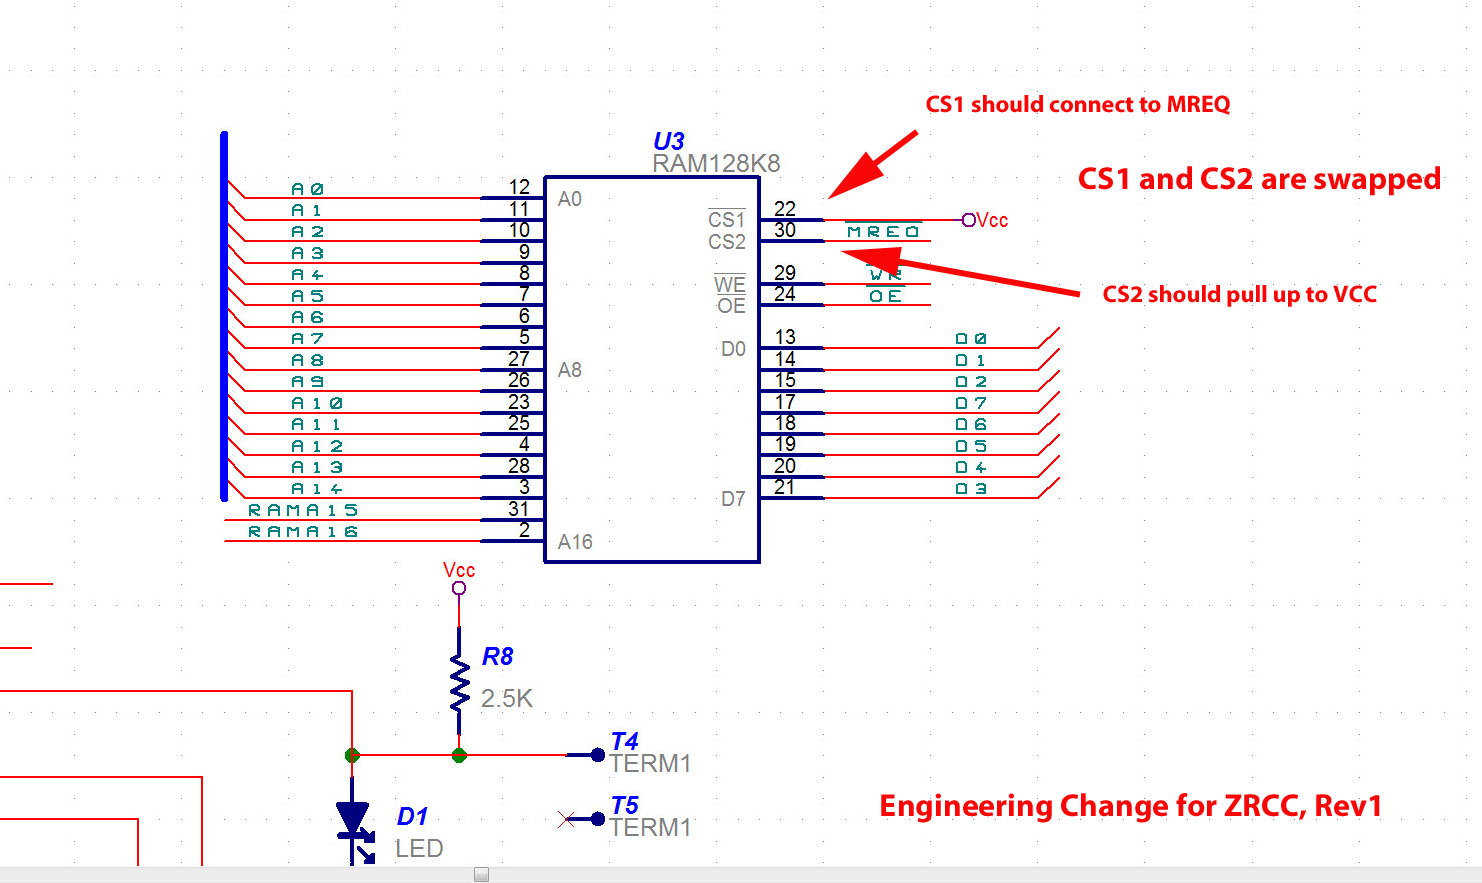 www.retrobrewcomputers.org_lib_plugins_ckgedit_fckeditor_userfiles_image_builderpages_plasmo_zrcc_zrcc1_zrcc_scm_rev1_ec.jpg